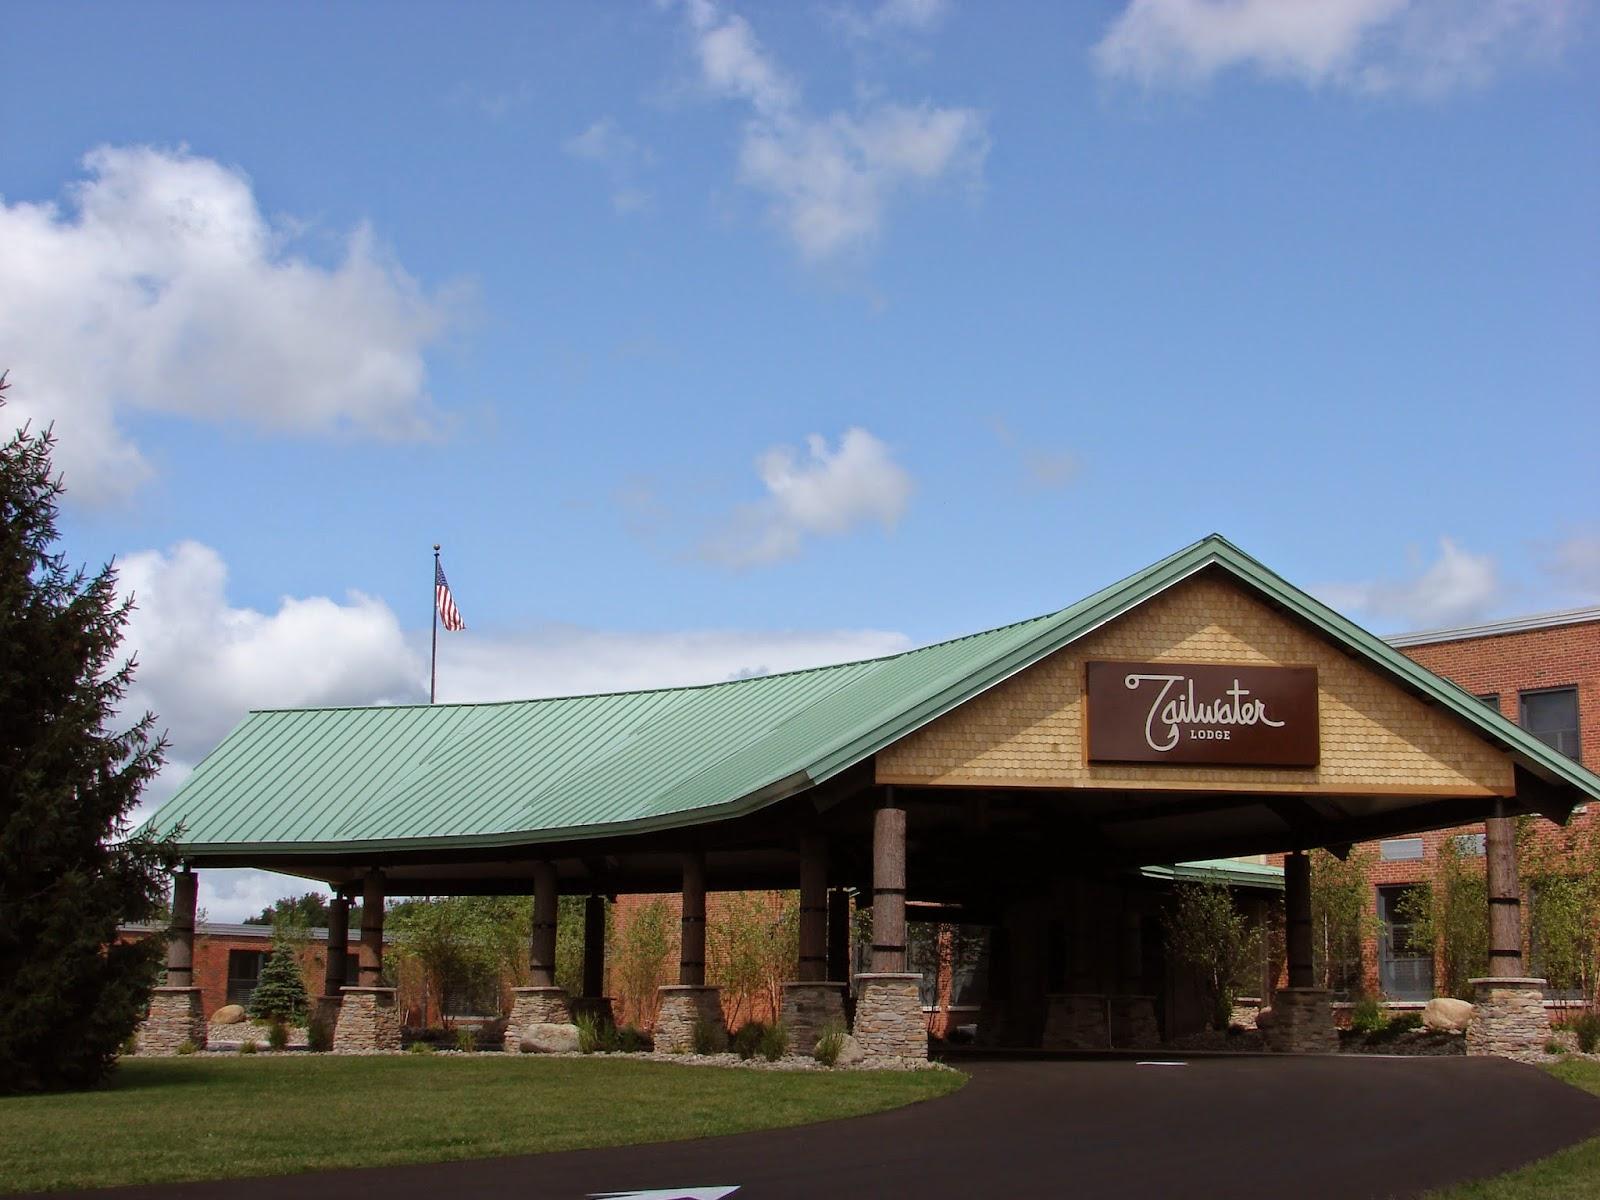 Sandra Scott 39 S Travel Columns Tailwater Lodge In Altmar New York